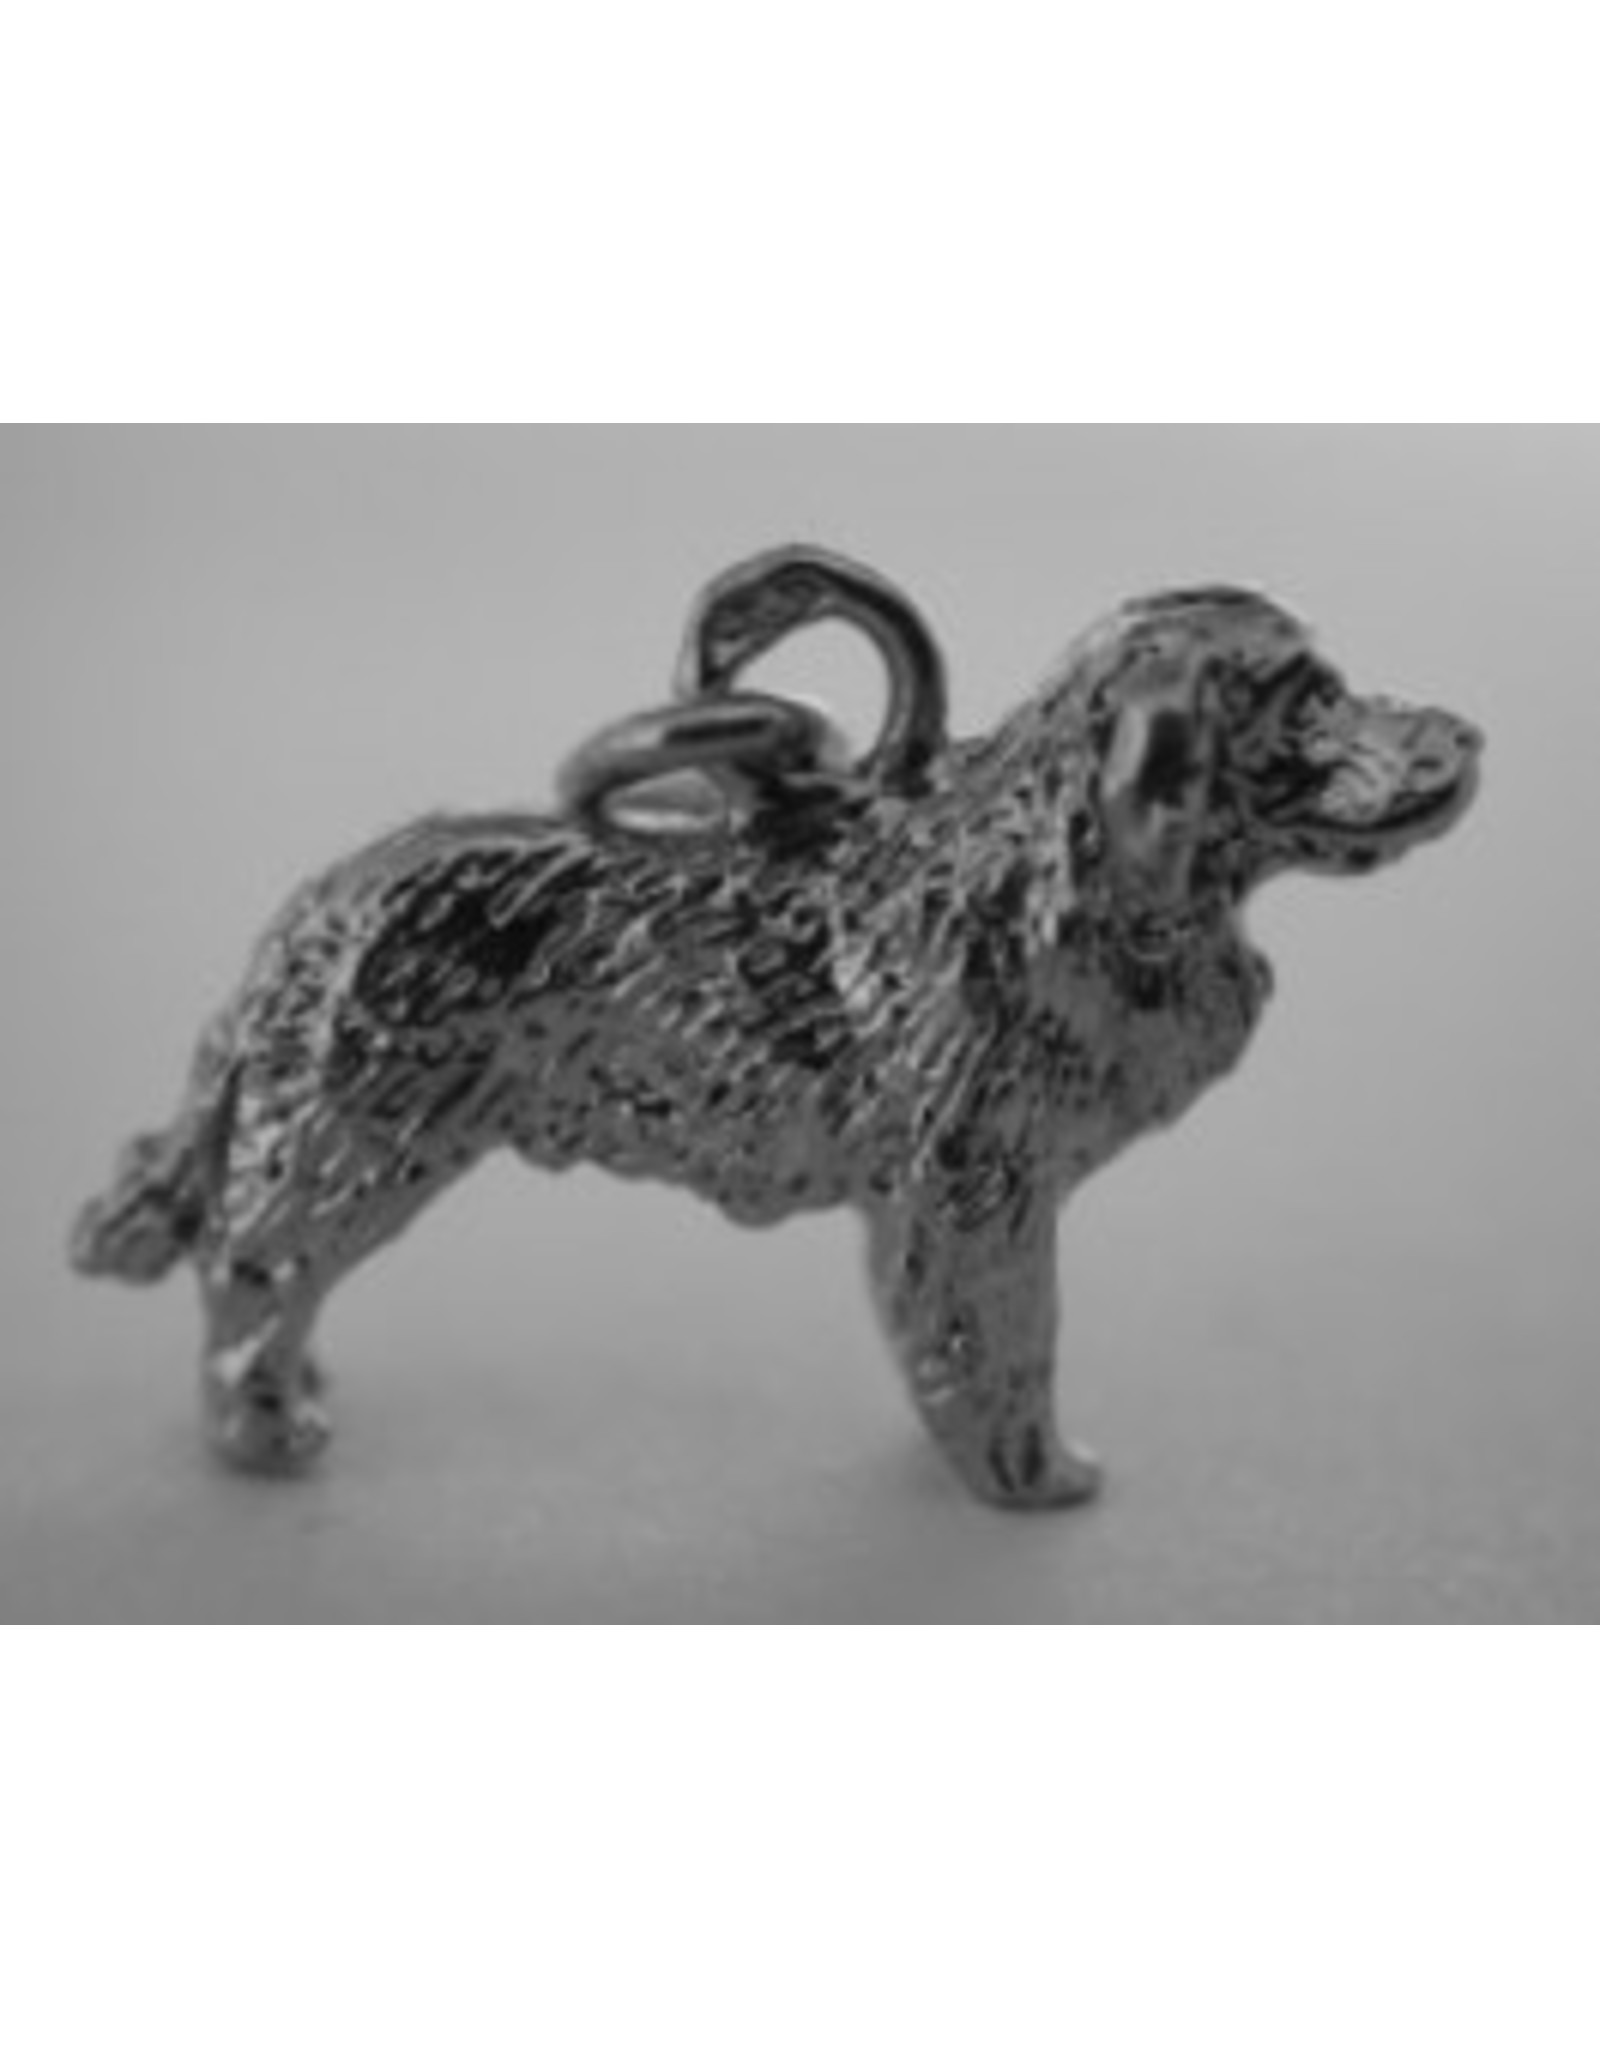 Handmade by Hanneke Weigel Sterling silver Cao da serra da estrela